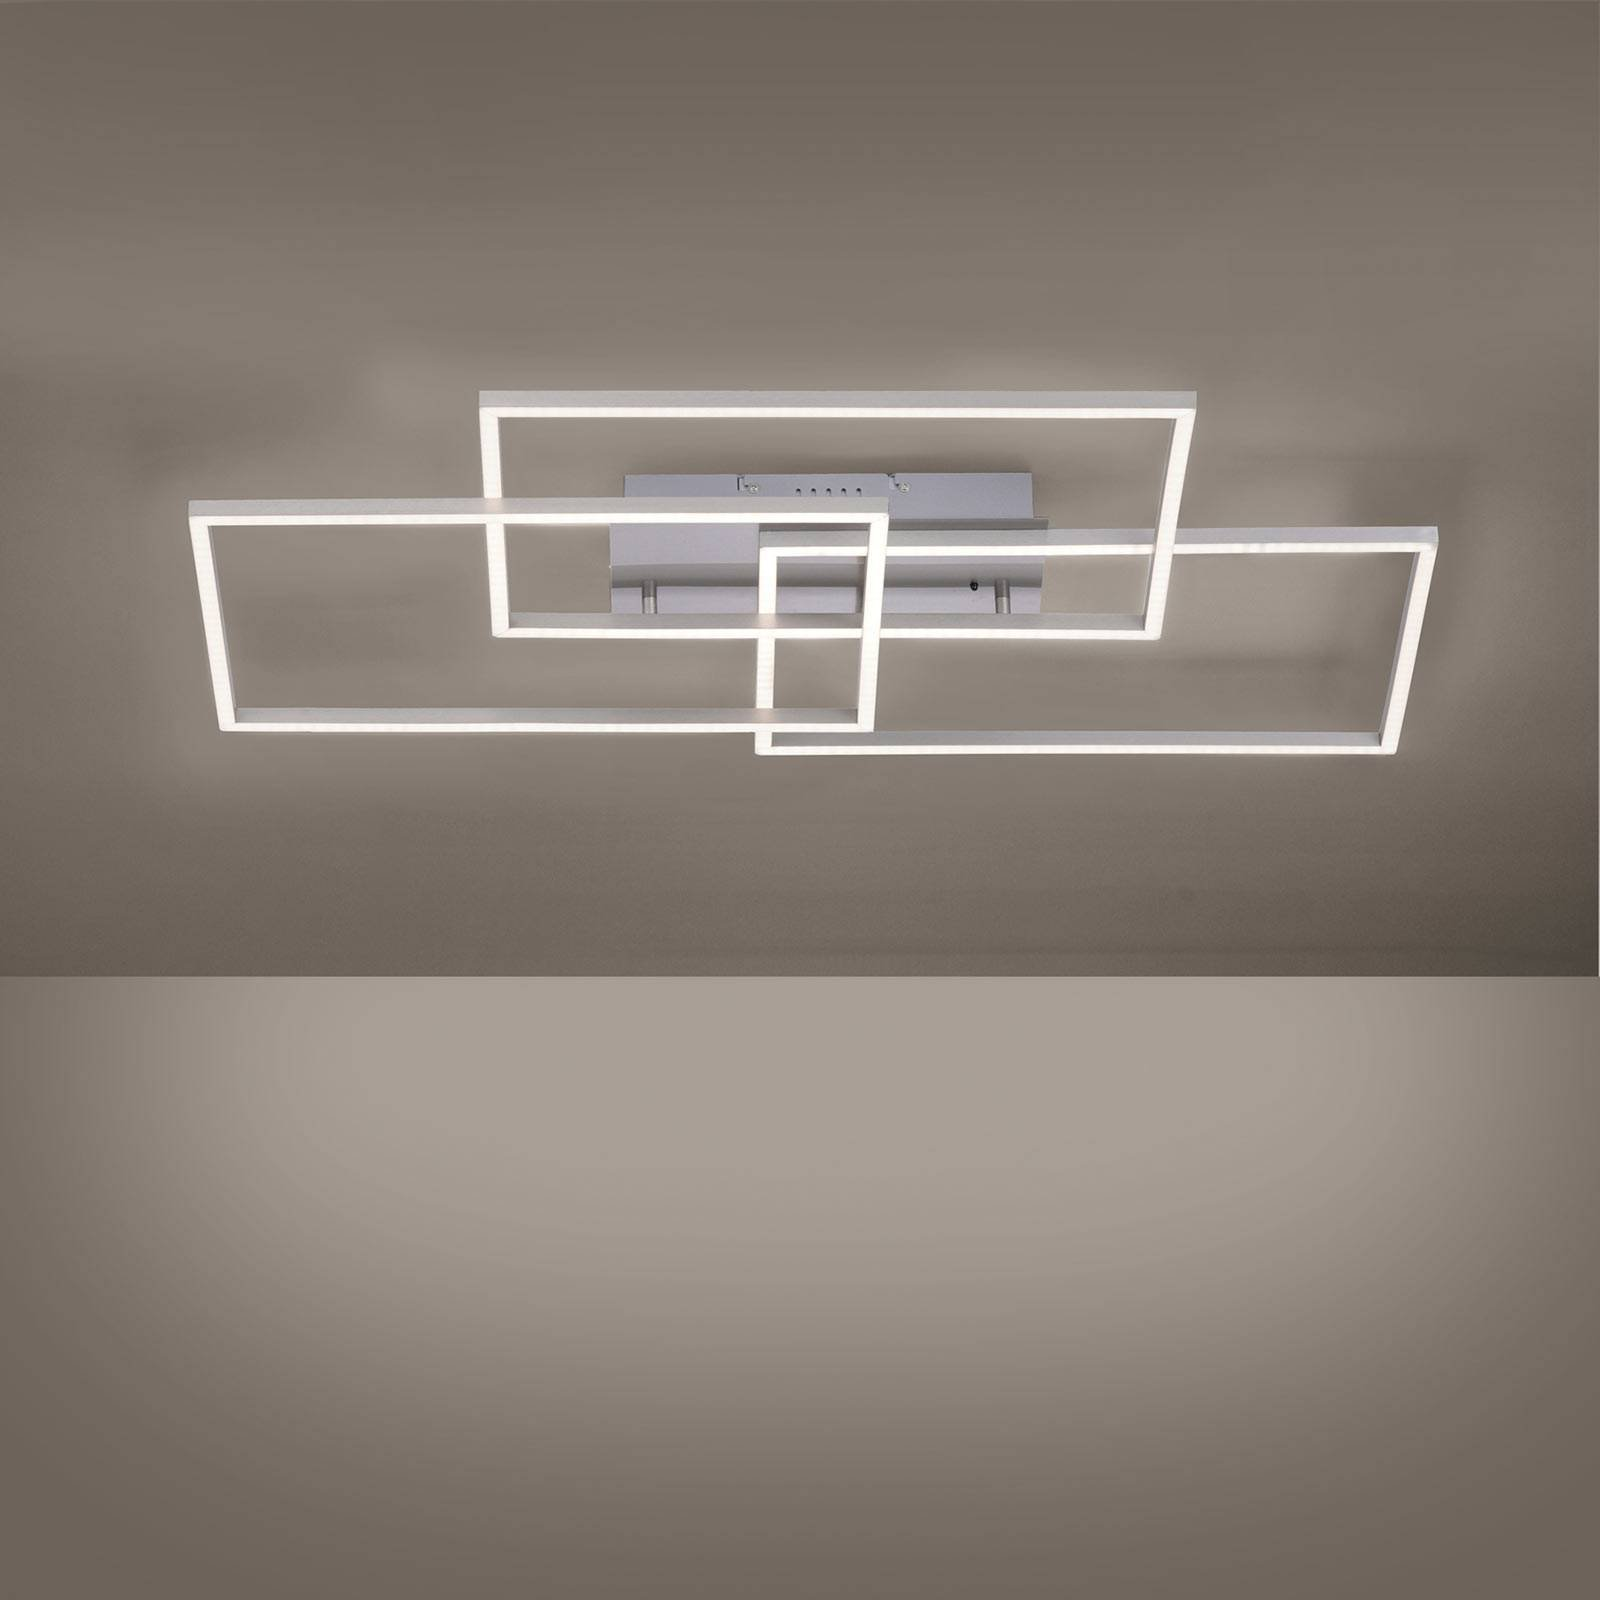 Iven LED-taklampe, stål, 3 lyskilder, rektangel